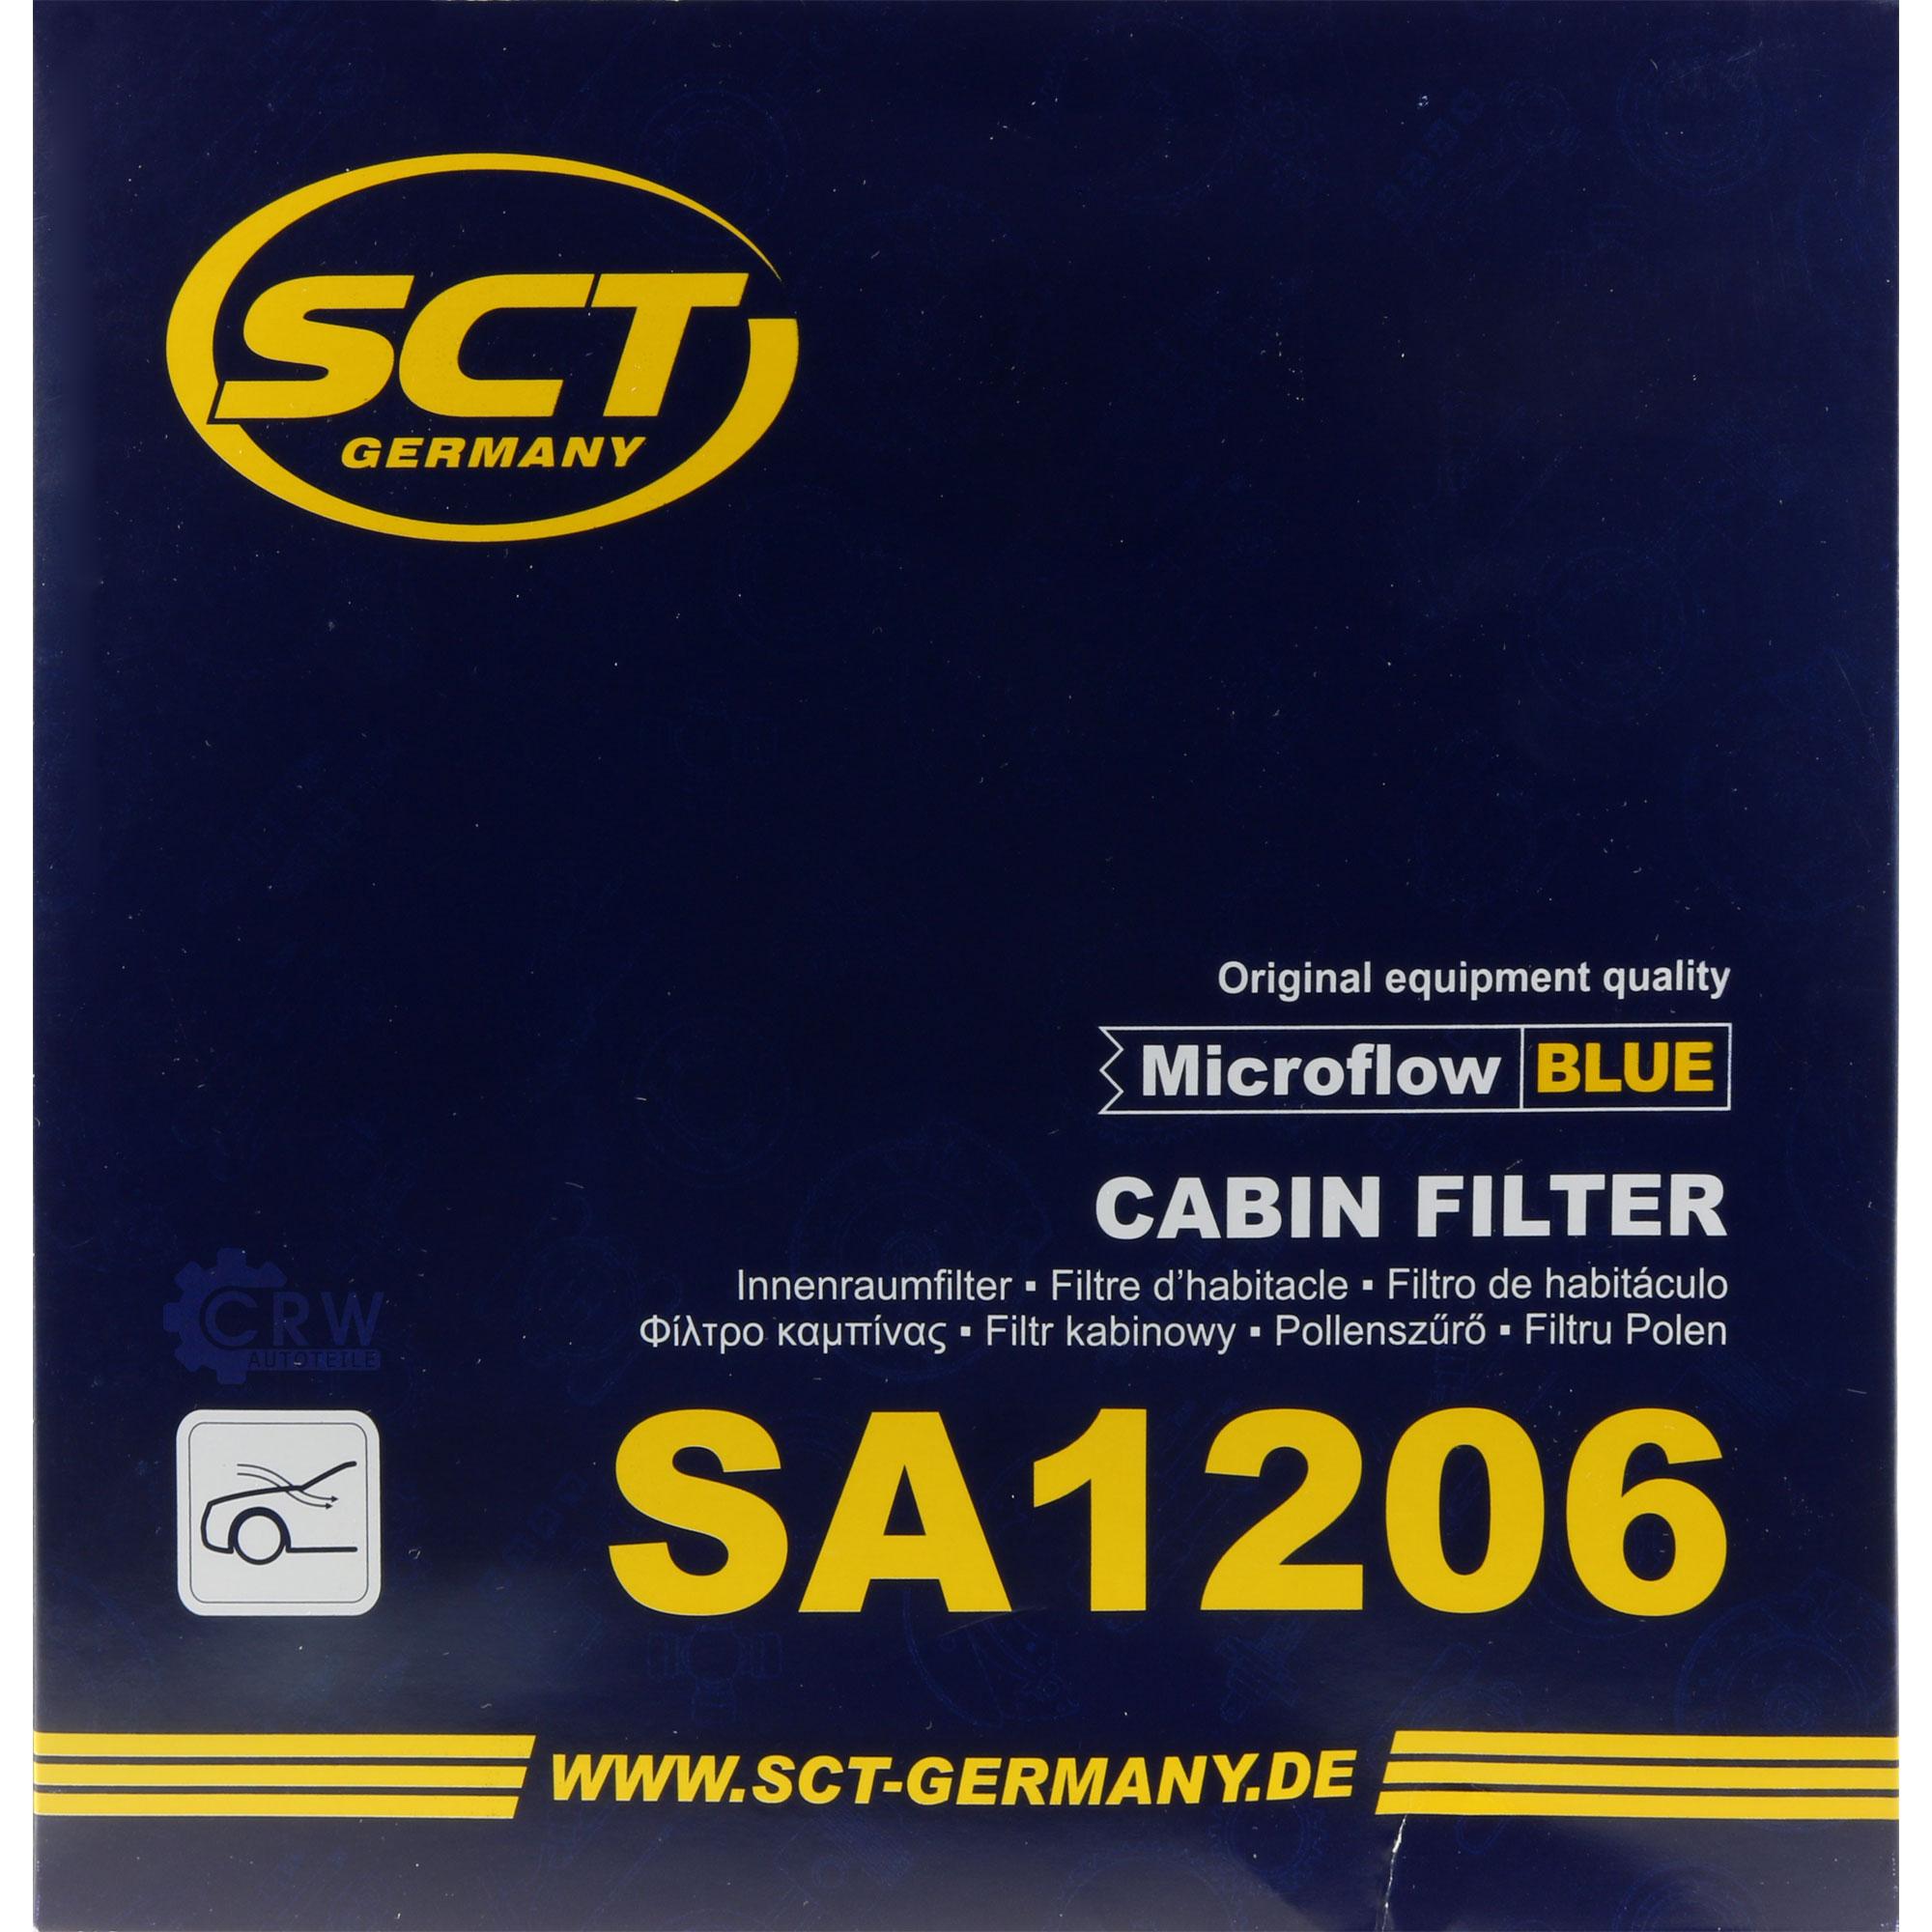 Cambio-de-aceite-set-5l-MANNOL-energy-premium-5w-30-aceite-del-motor-filtro-sct-kit-10138291 miniatura 9